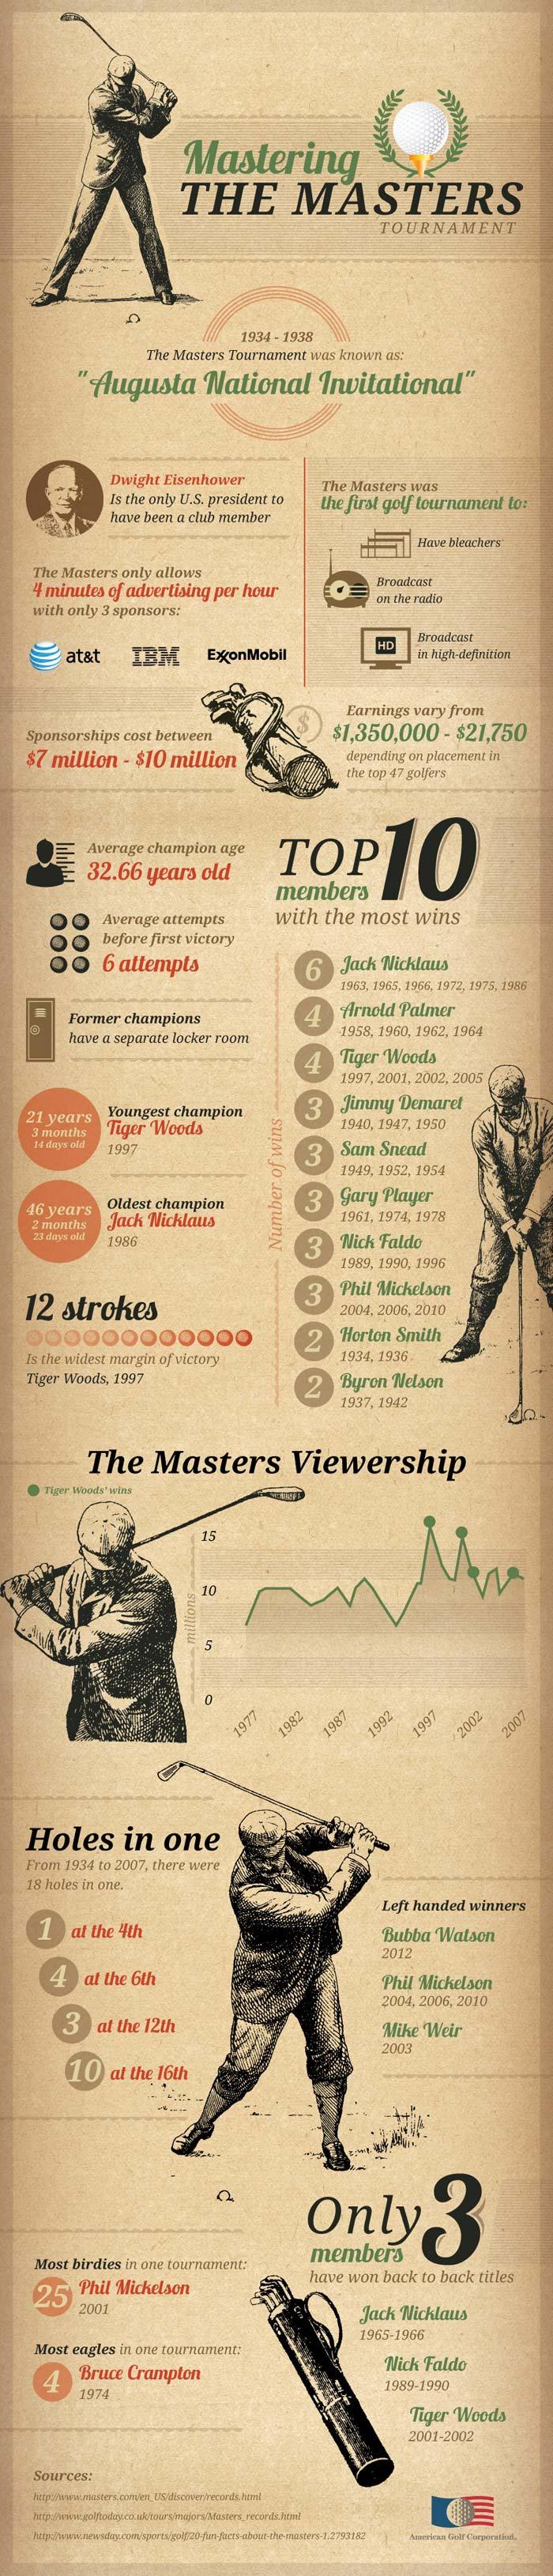 Masterin-The-Masters-Tourna